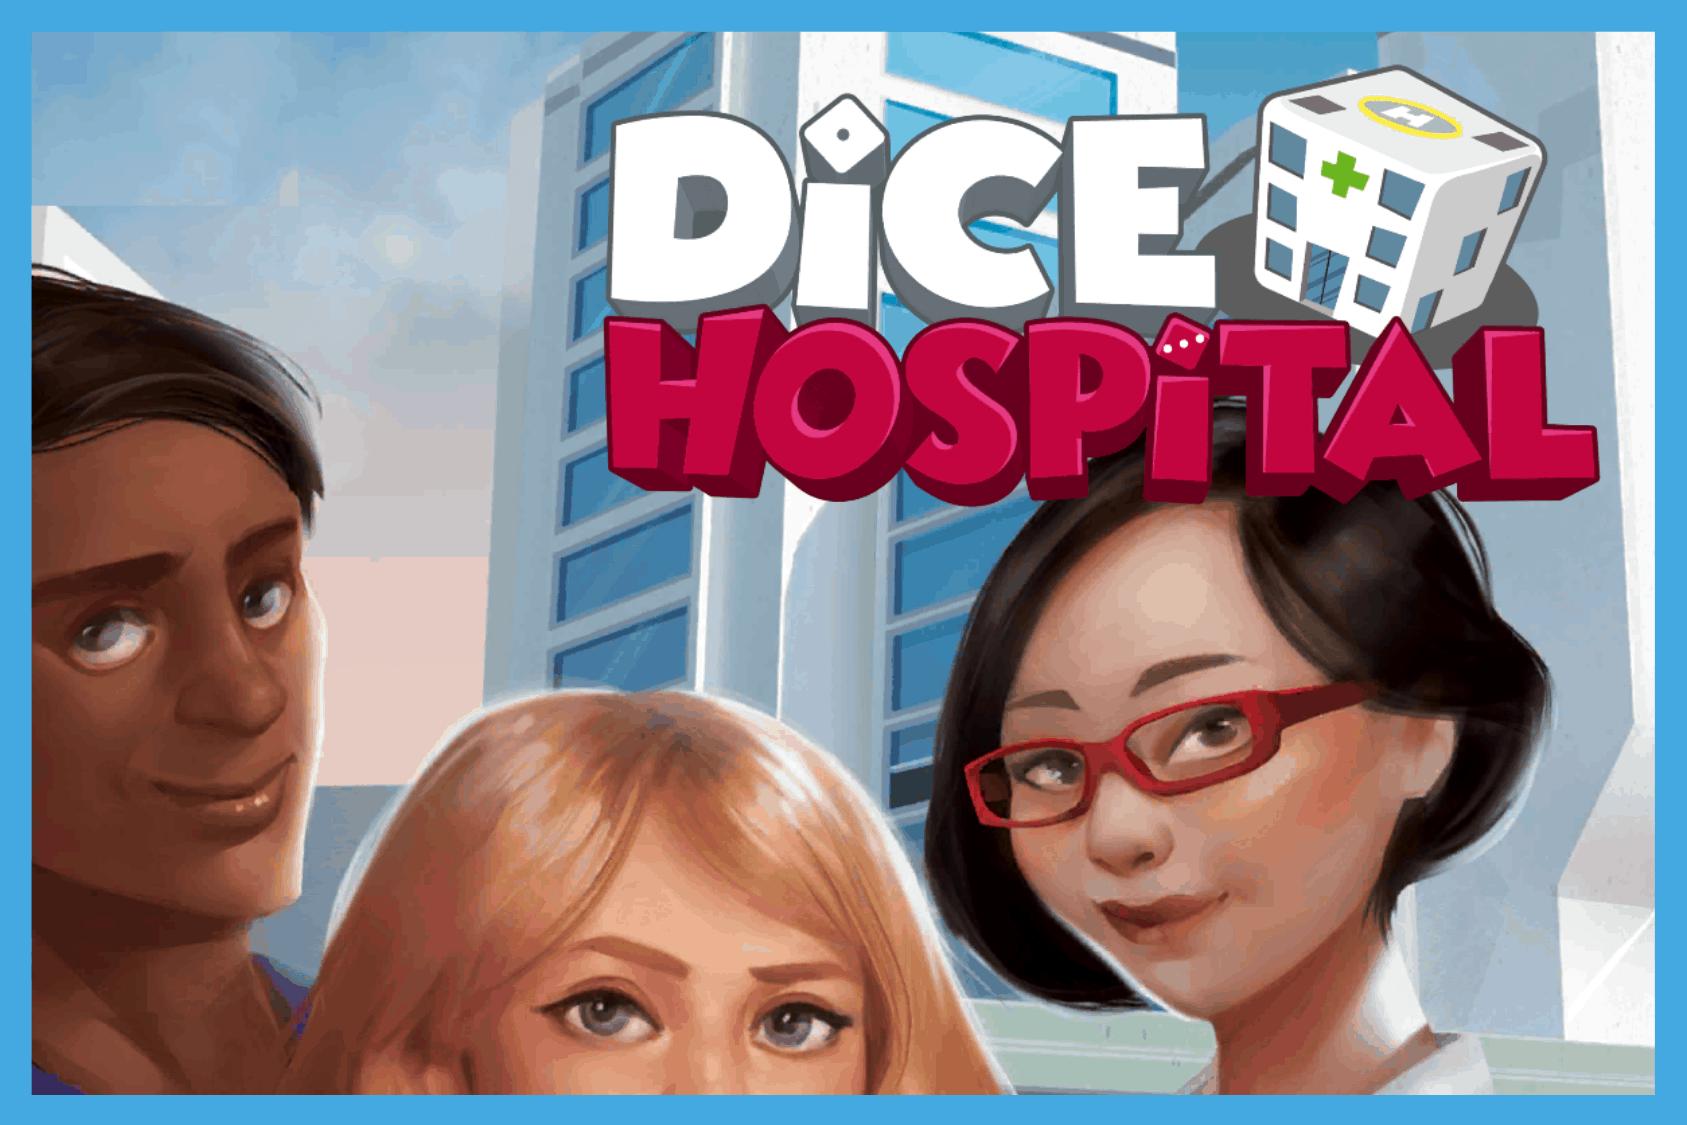 Dice Hospital App Review